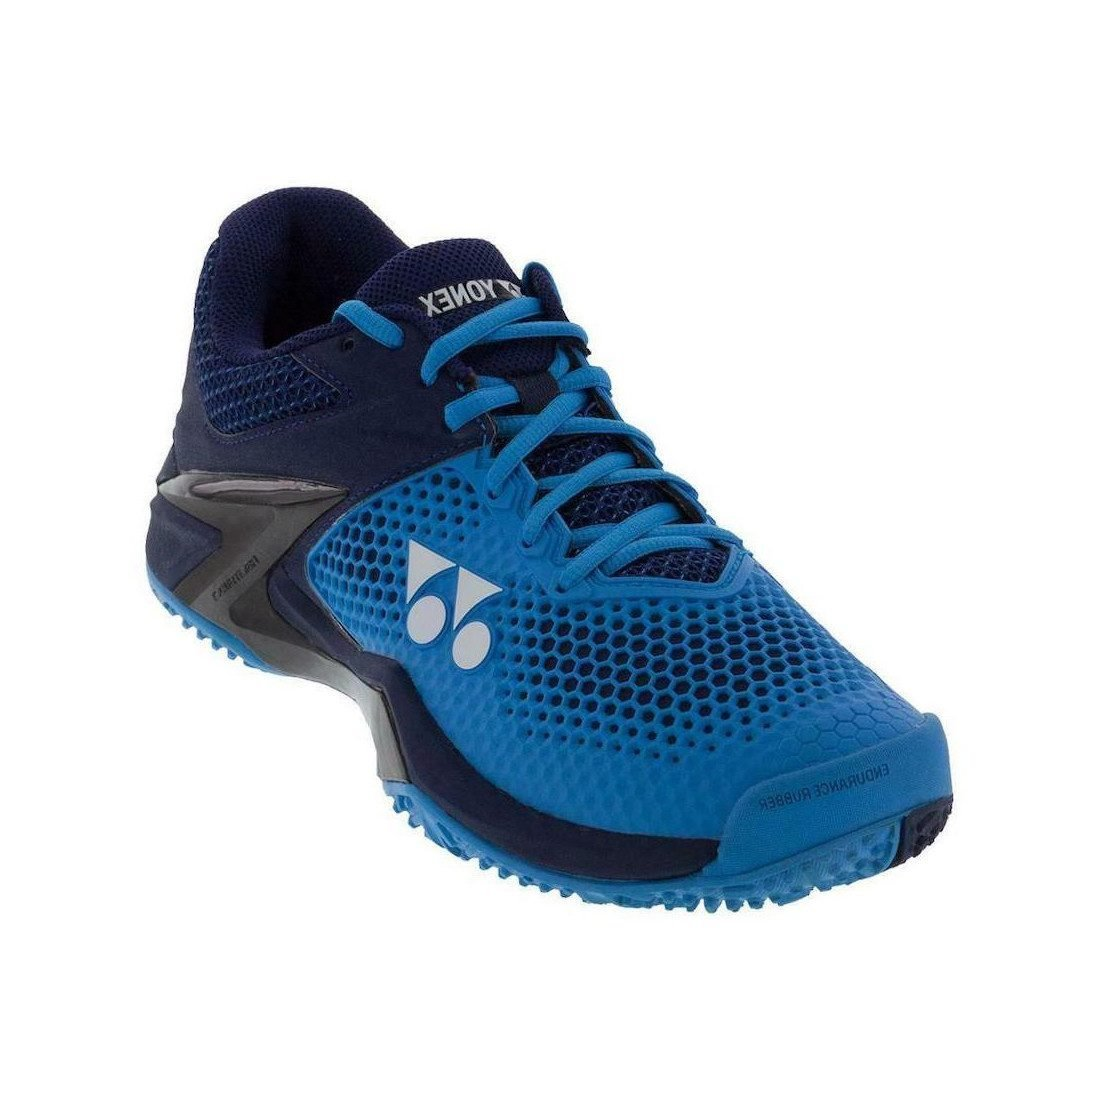 Yonex Tennis Shoes – Power Cushion Eclipsion 2 Paris Clay for Men (Blue & Navy)